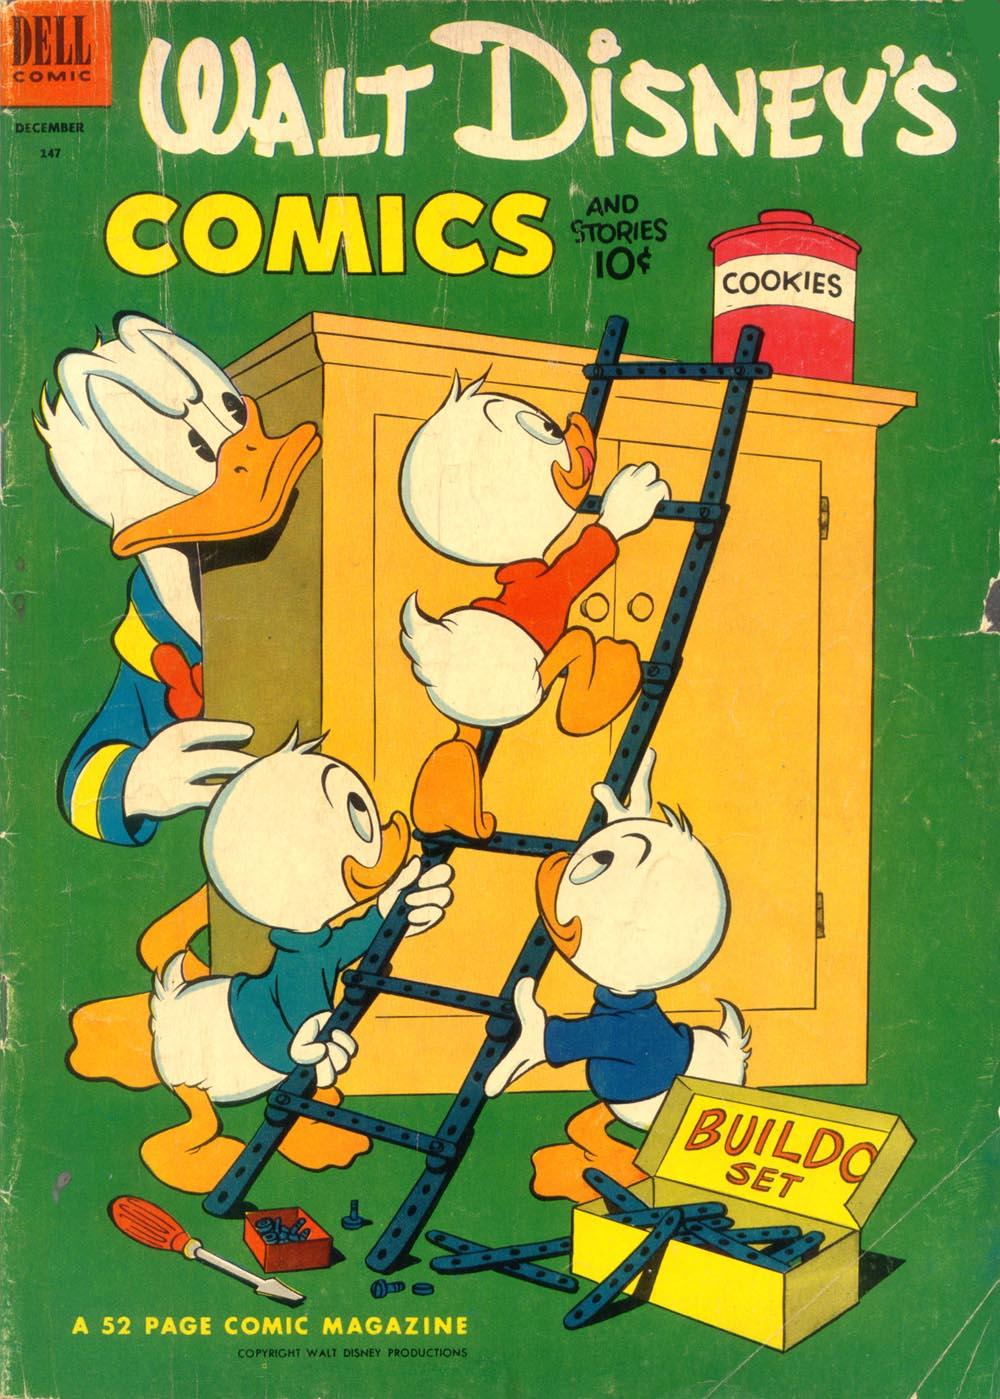 Walt Disneys Comics and Stories 147 Page 1